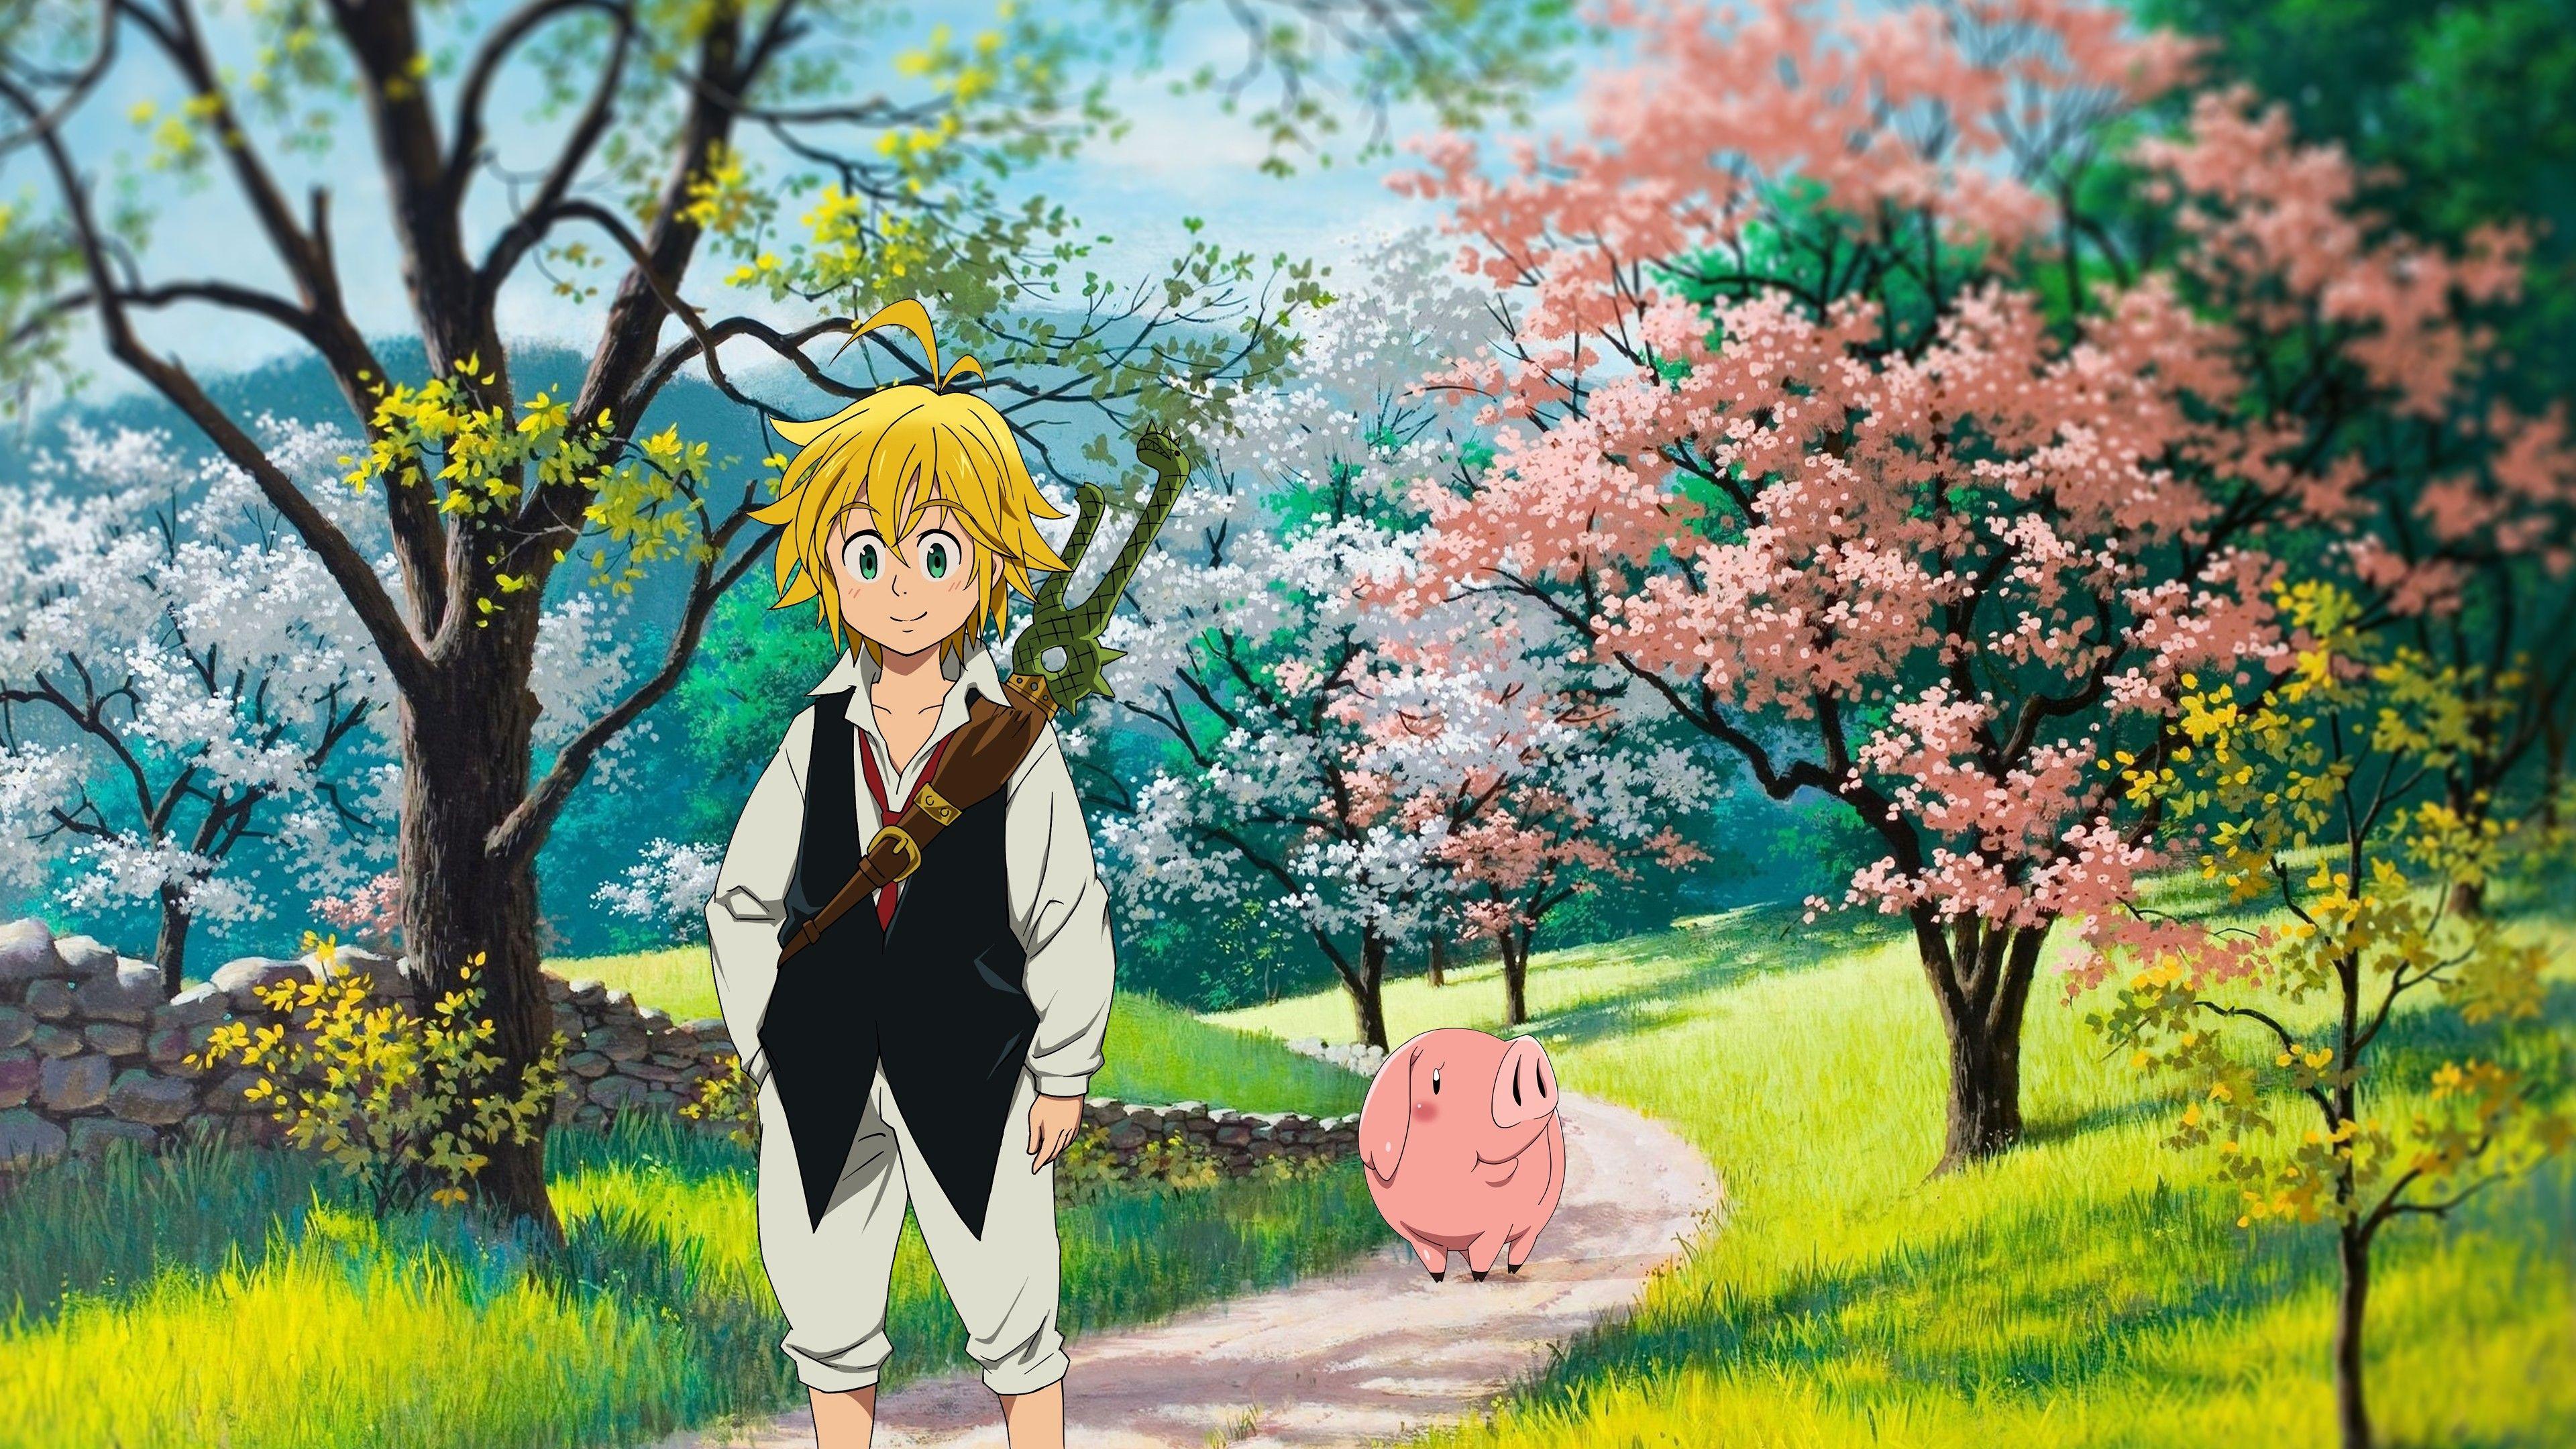 Nanatsu No Taizai Meliodas Hawk Walking Sakura Anime Wallpaper Seven Deadly Sins Anime Art Wallpaper